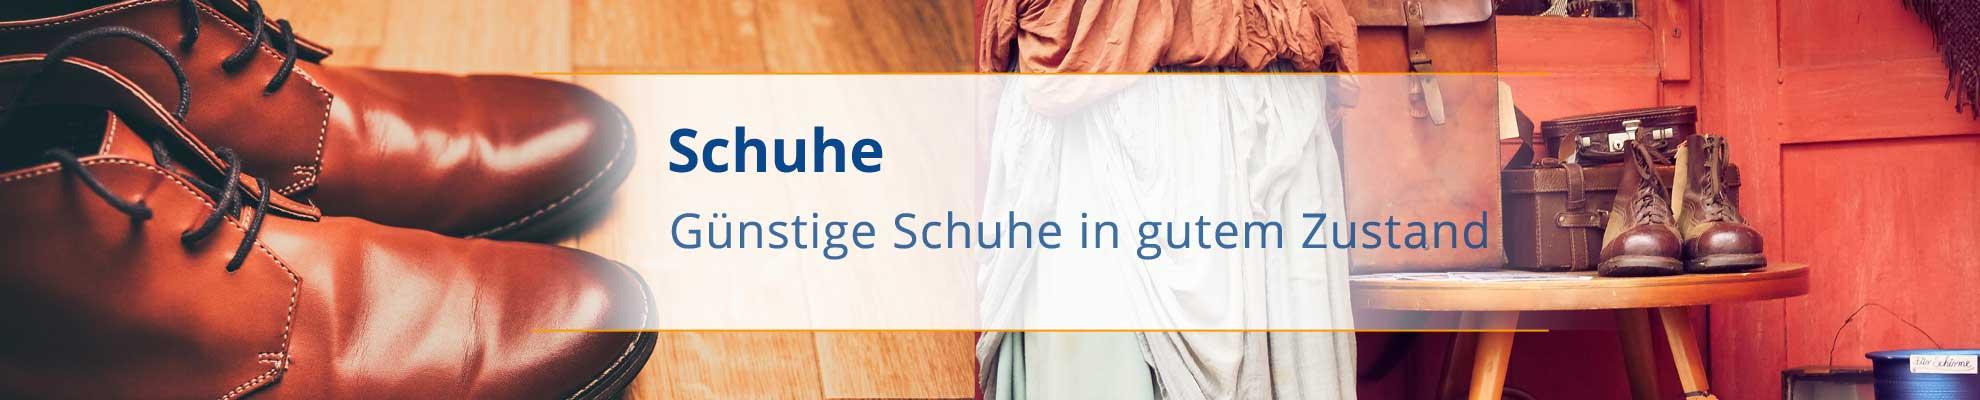 Magazin Halsenbach - günstige Schuhe